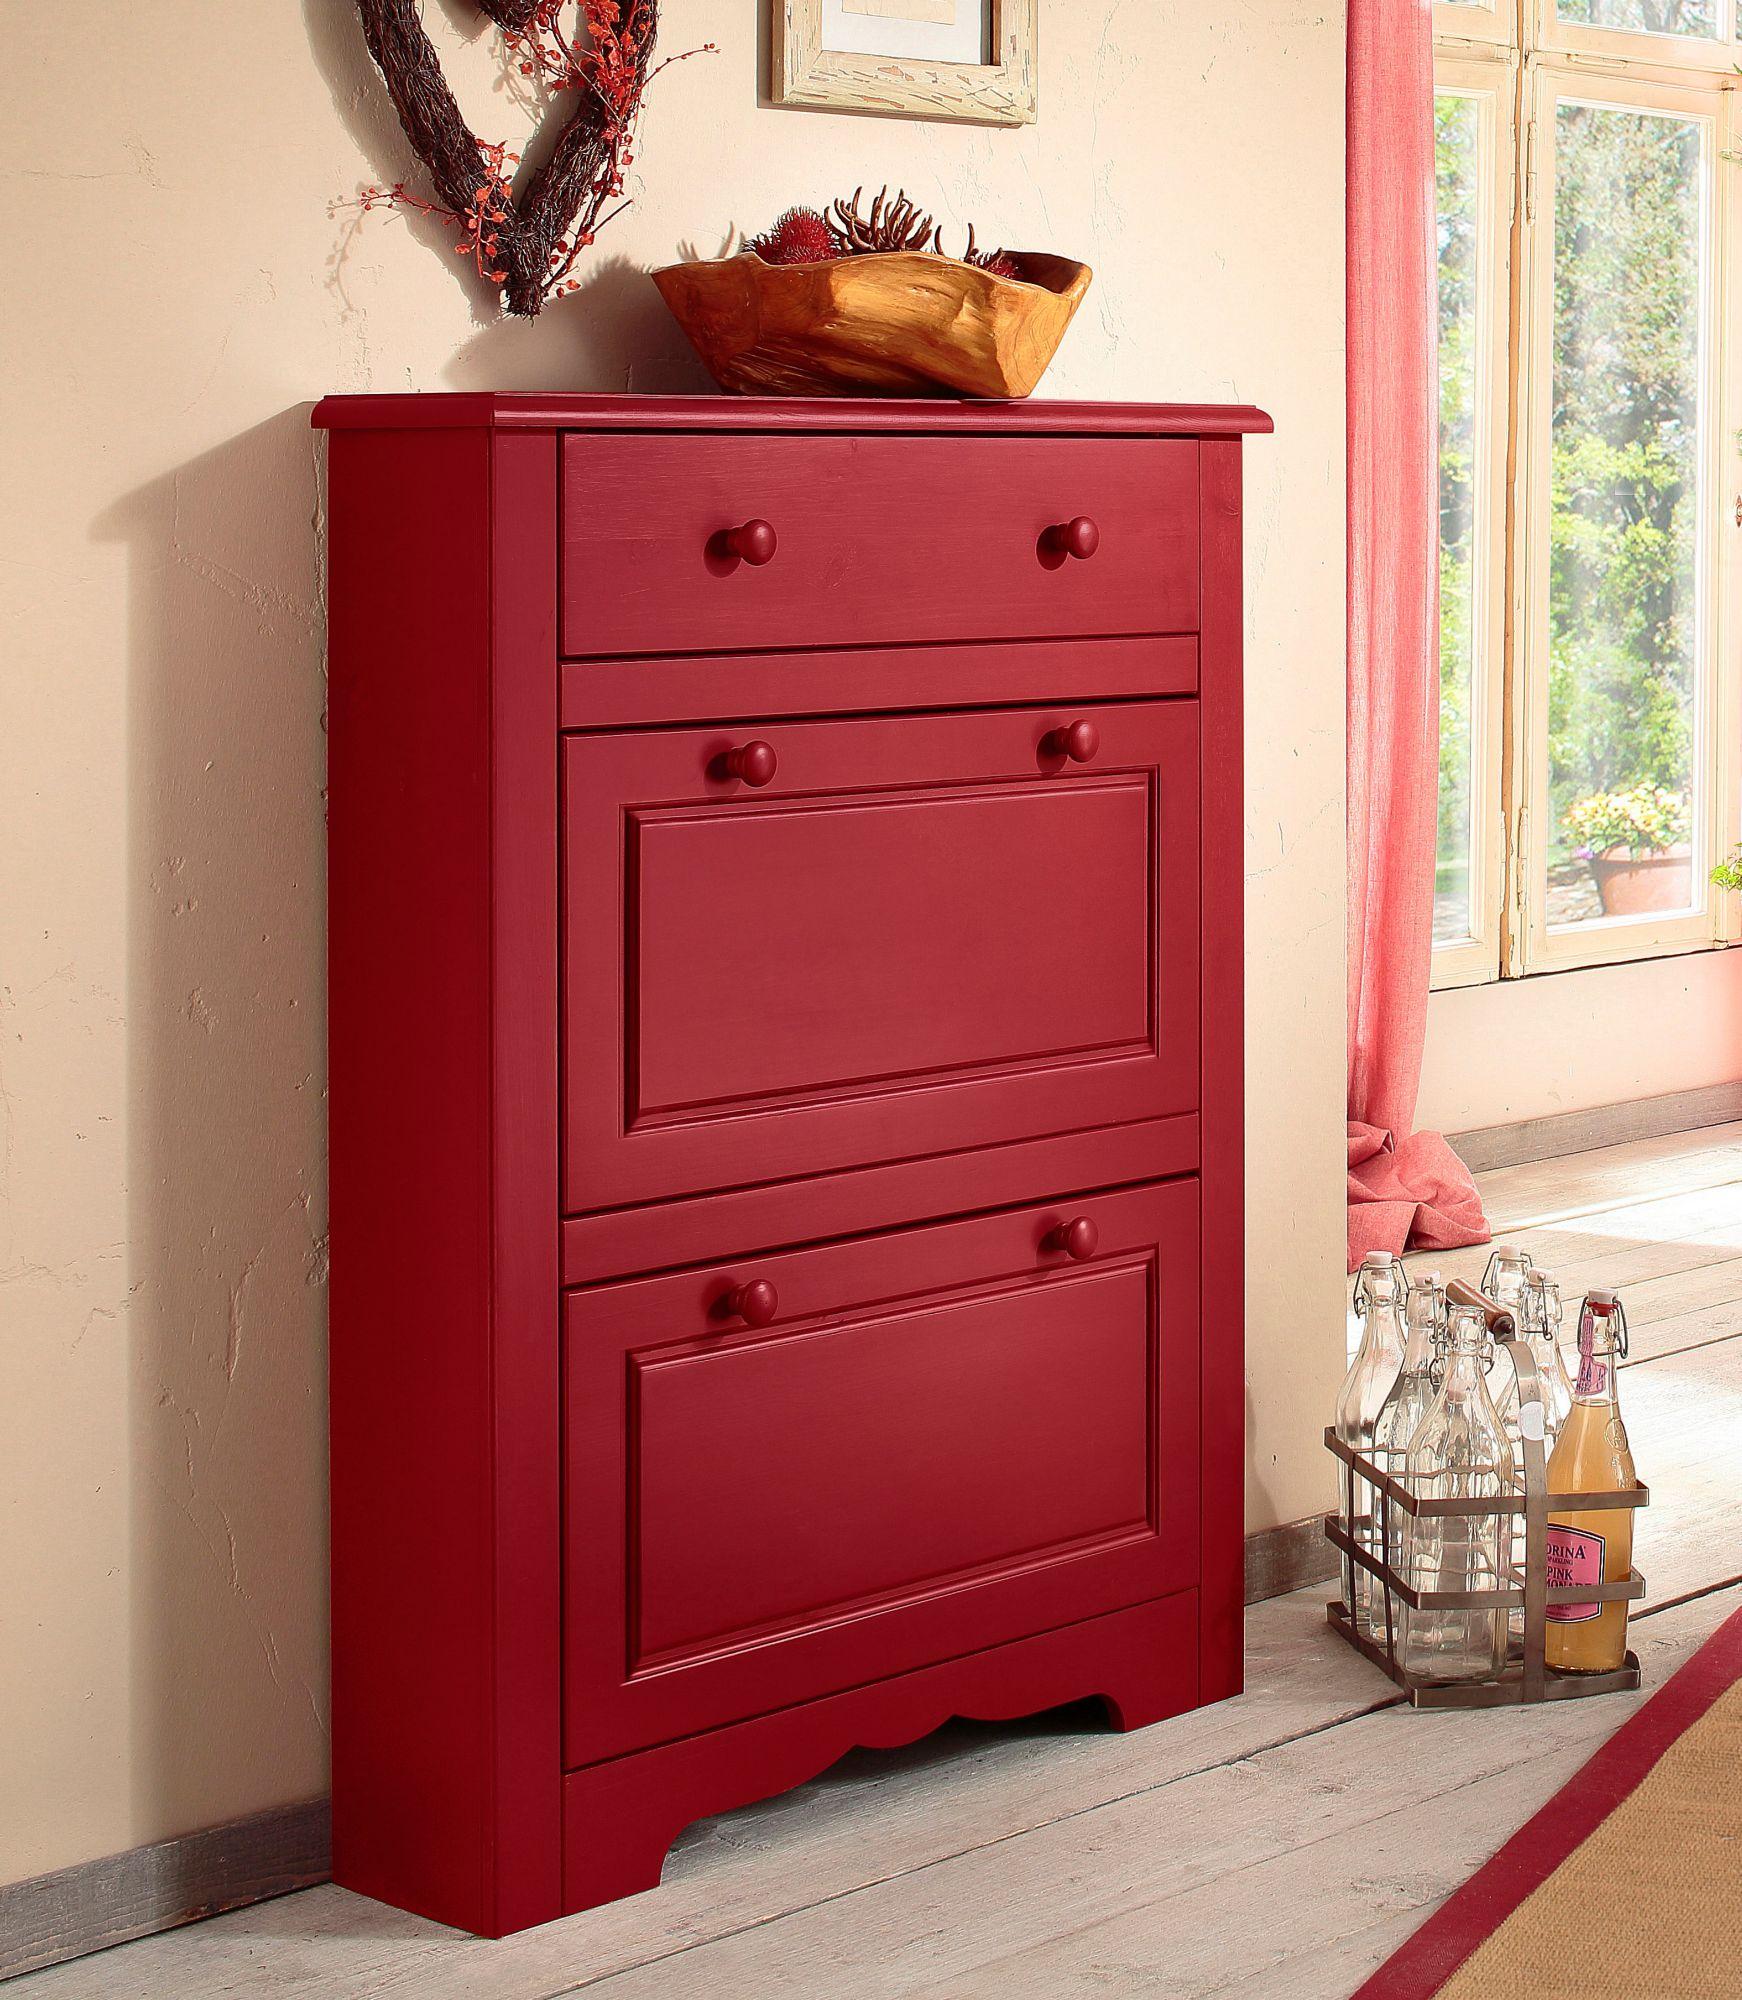 schuhschrank dielenm bel flur home affaire livorno rot. Black Bedroom Furniture Sets. Home Design Ideas